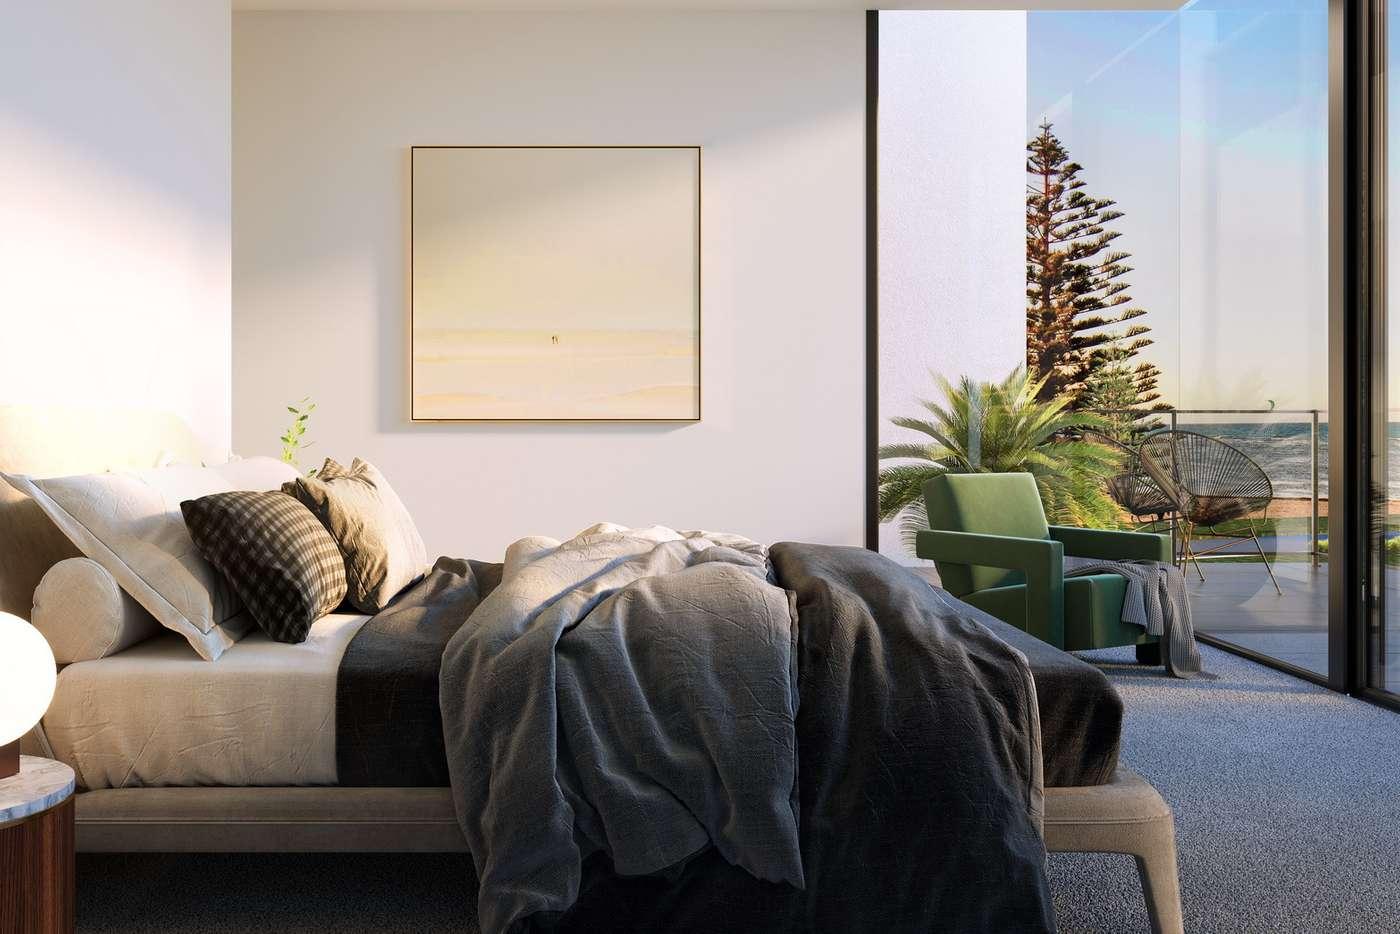 Fifth view of Homely house listing, 217B Esplanade, Altona VIC 3018